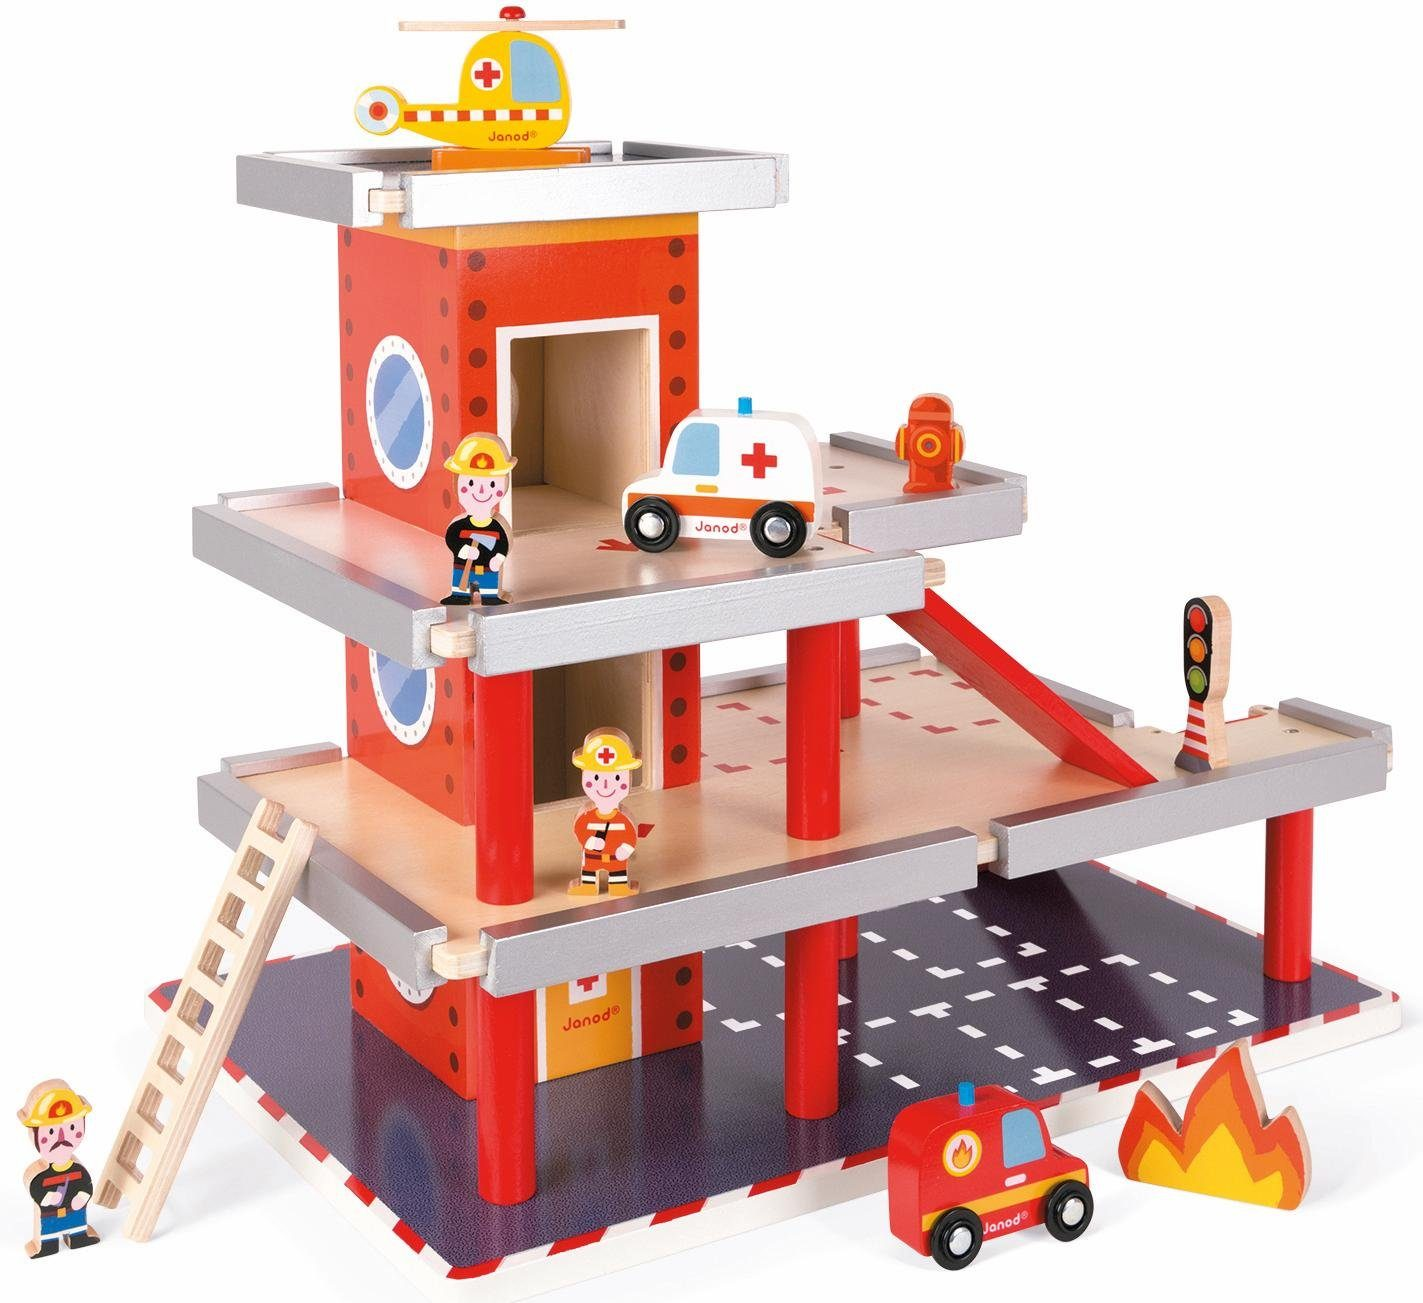 Janod Feuerwehrstation aus Holz